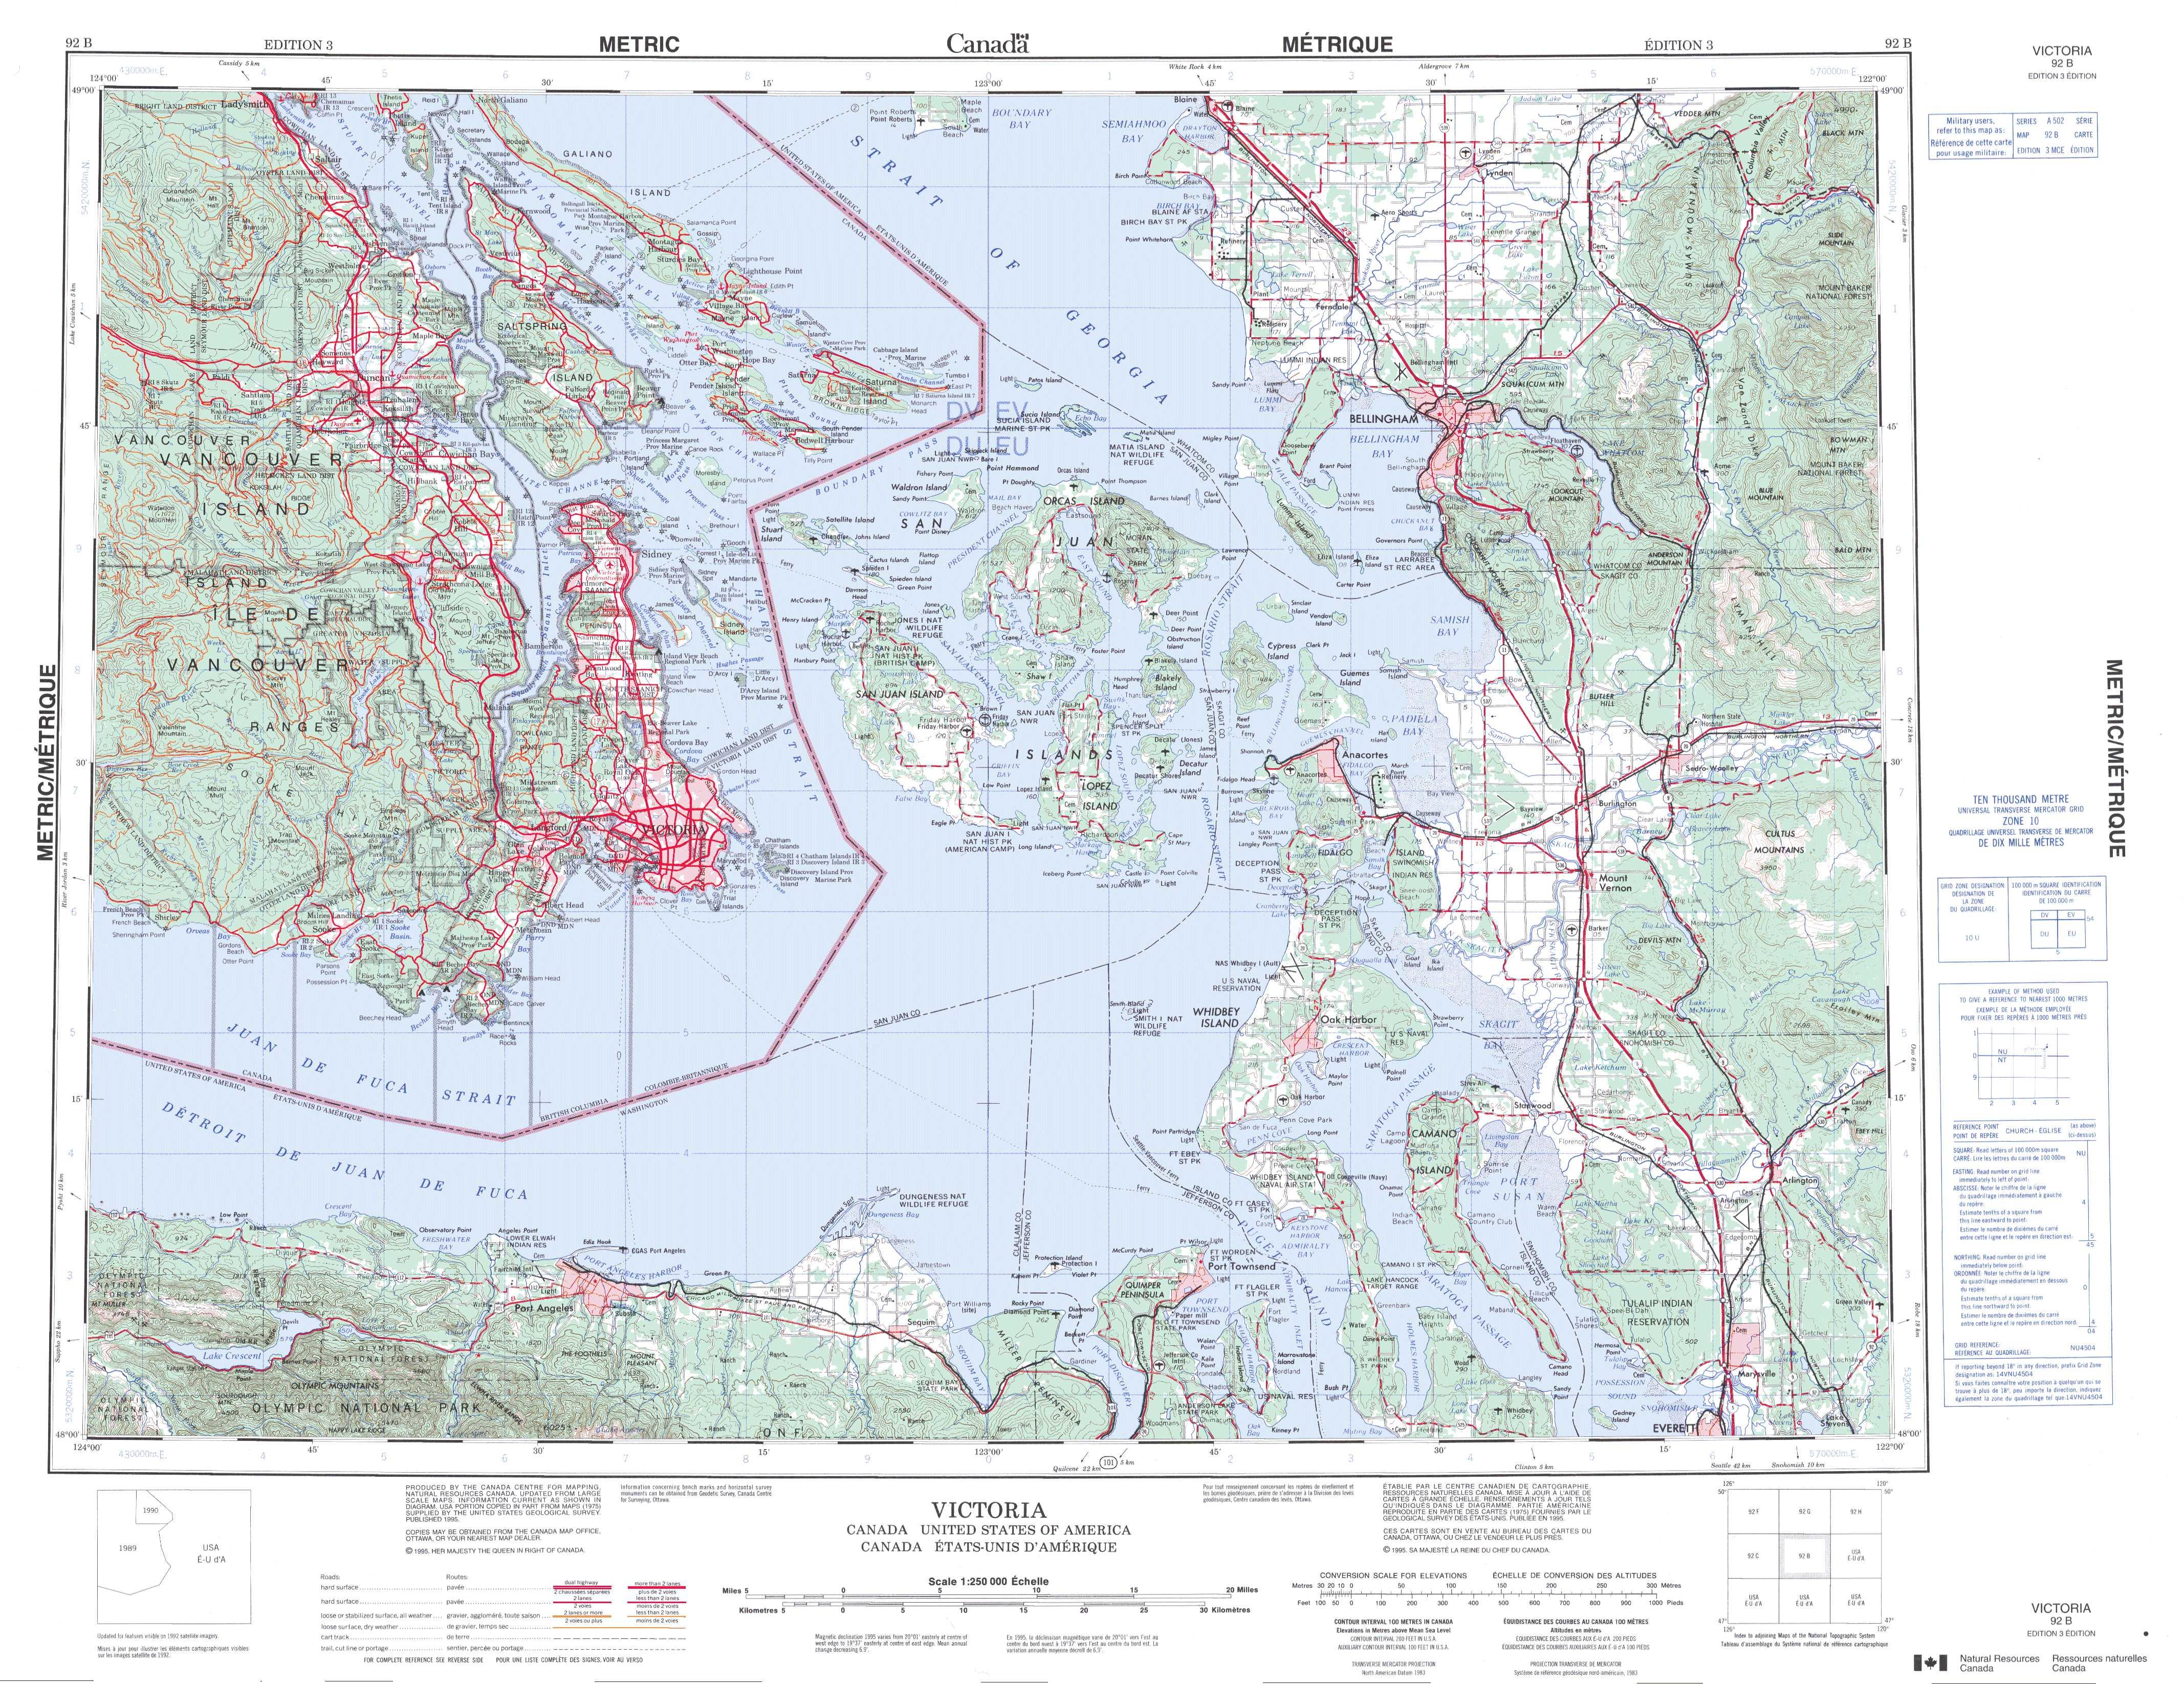 Printable Topographic Map Of Victoria 092B, Bc - Free Printable Topo Maps